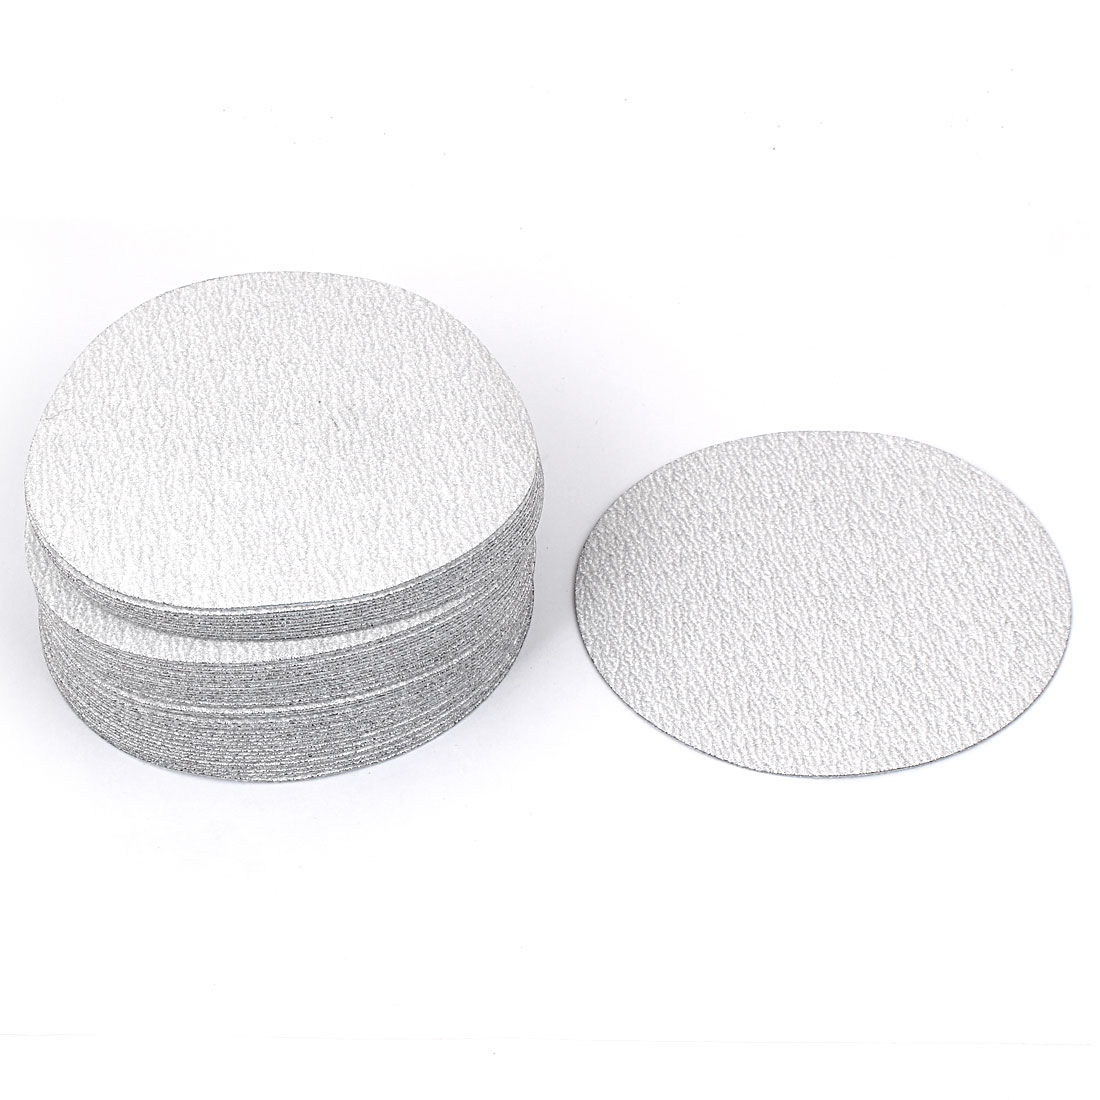 "5"" Dia Polishing Round Dry Abrasive Sanding Sandpaper Sheet Disc 240 Grit 50pcs"